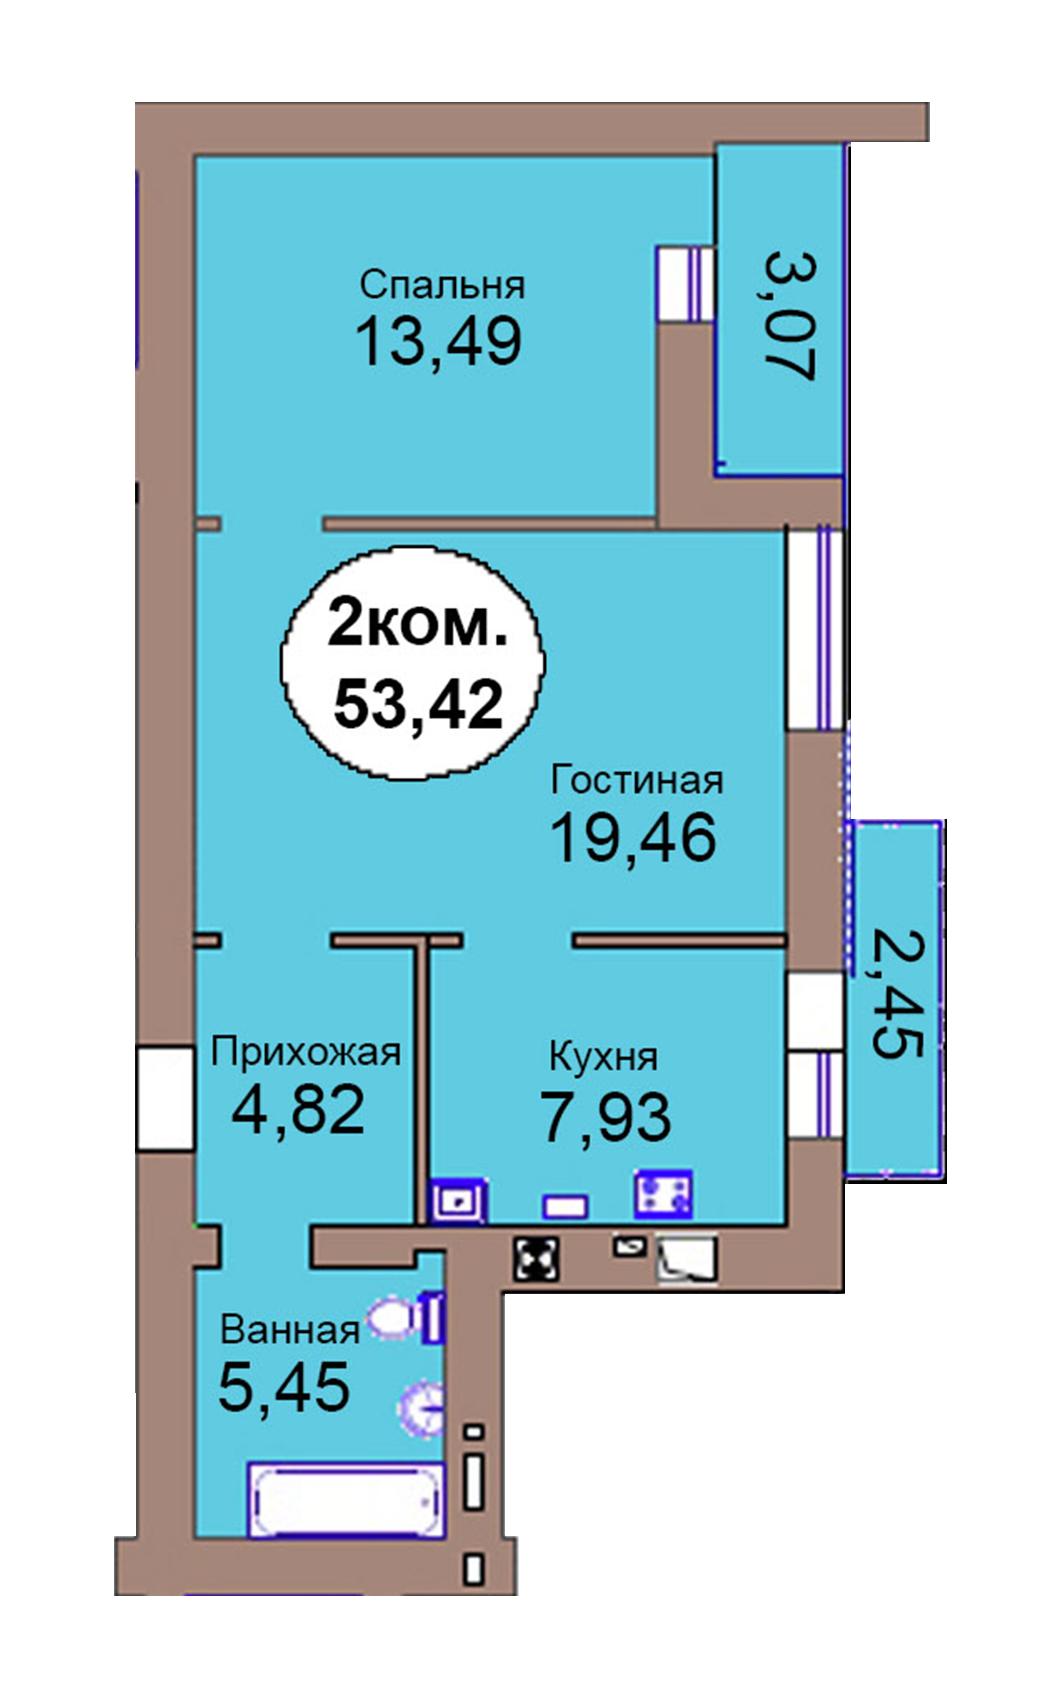 2-комн. кв. по пер. Калининградский, 4  кв. 96 в Калининграде